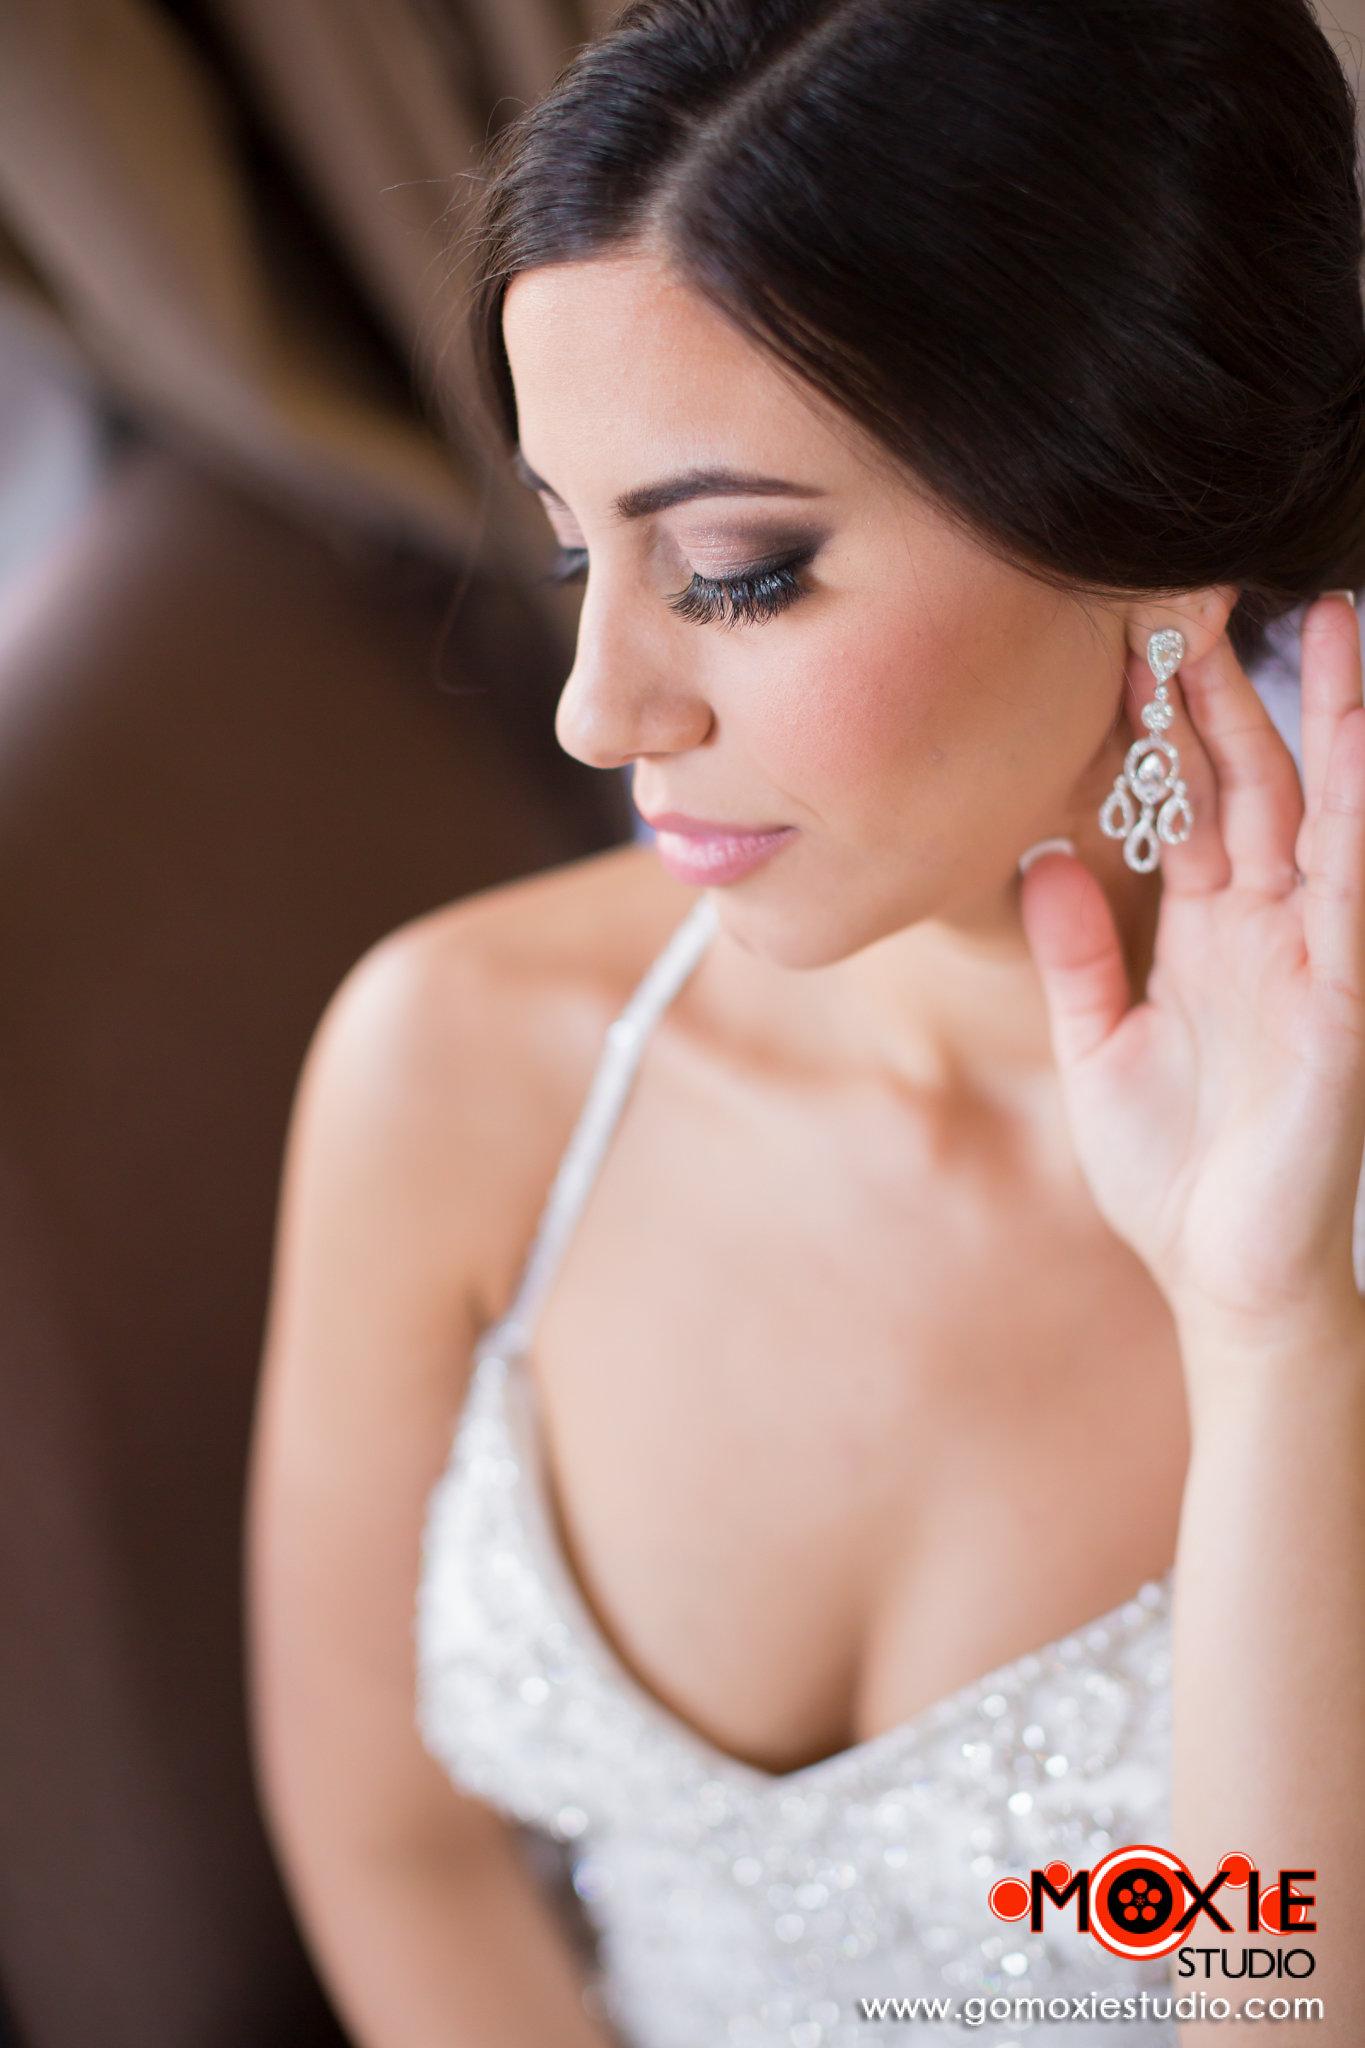 Alyssa Wedding Hair and Makeup